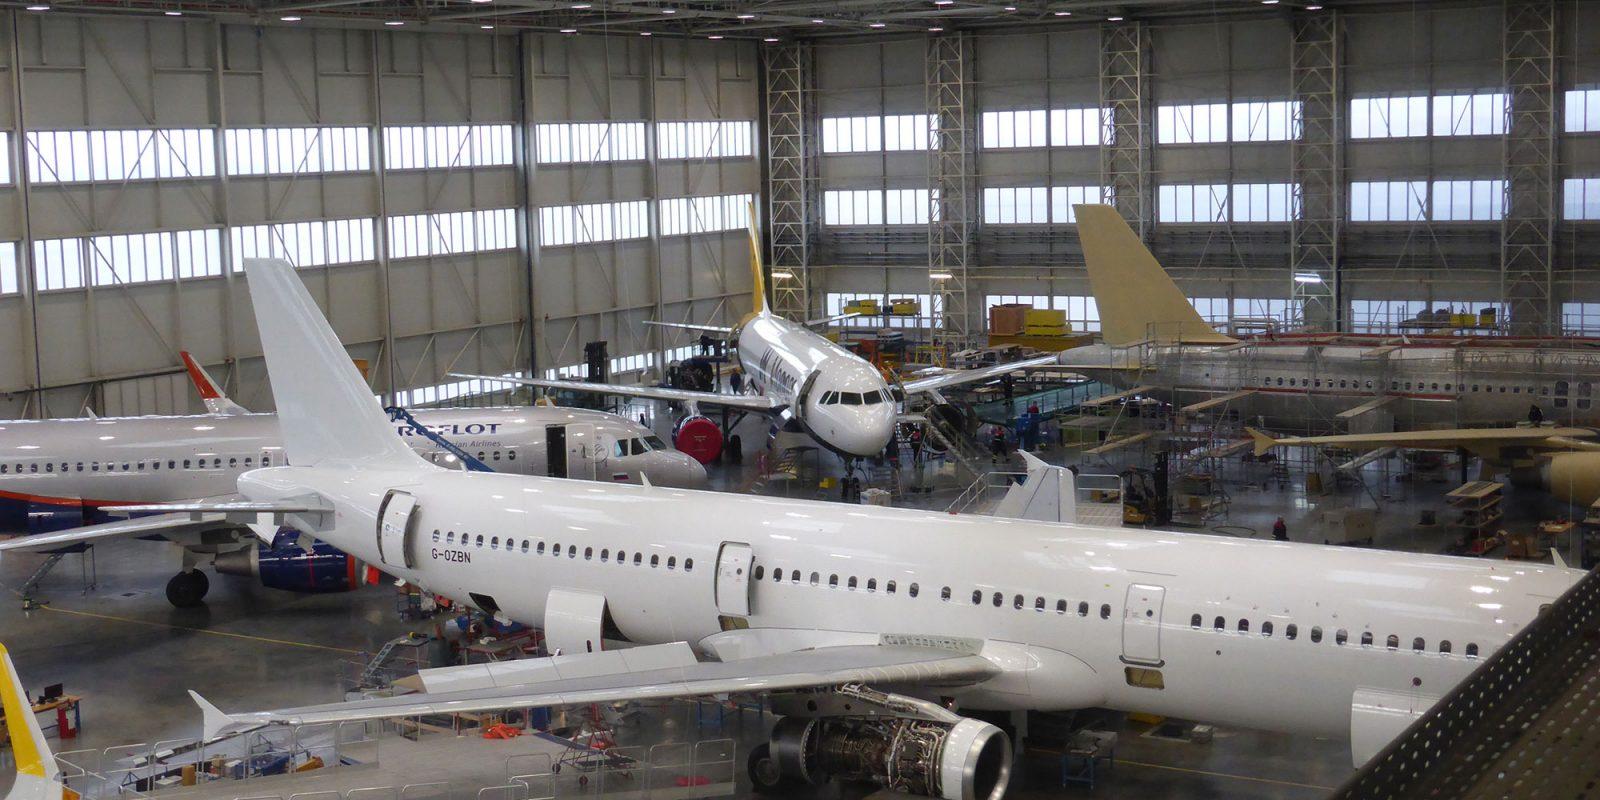 Aircraft-in-Hangar---Ostrava-Photo-1